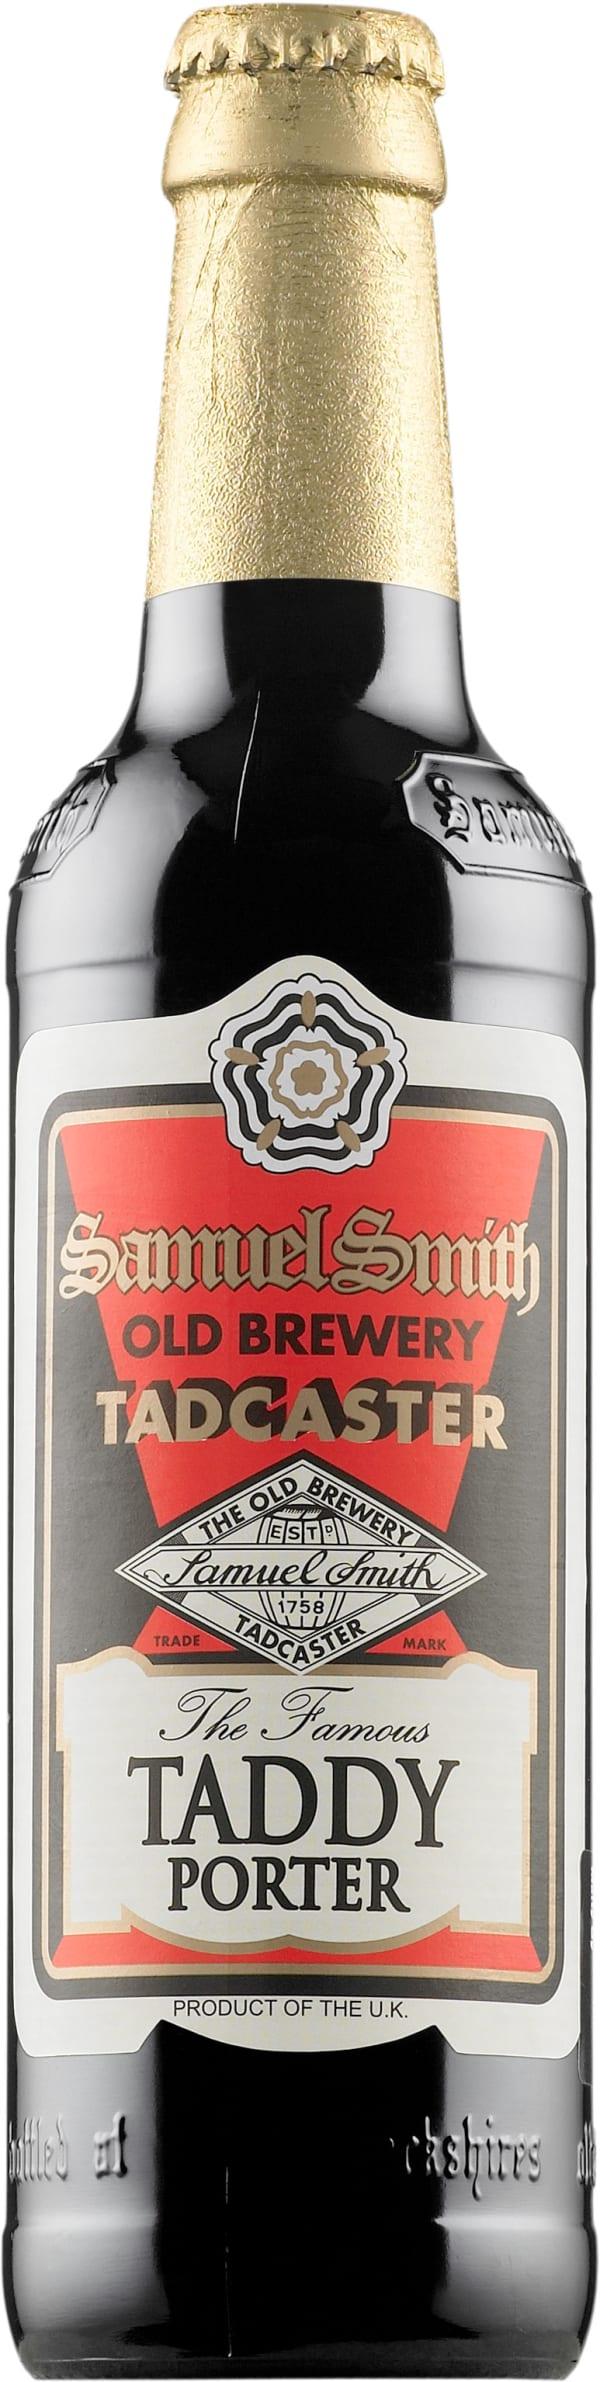 Samuel Smith Taddy Porter